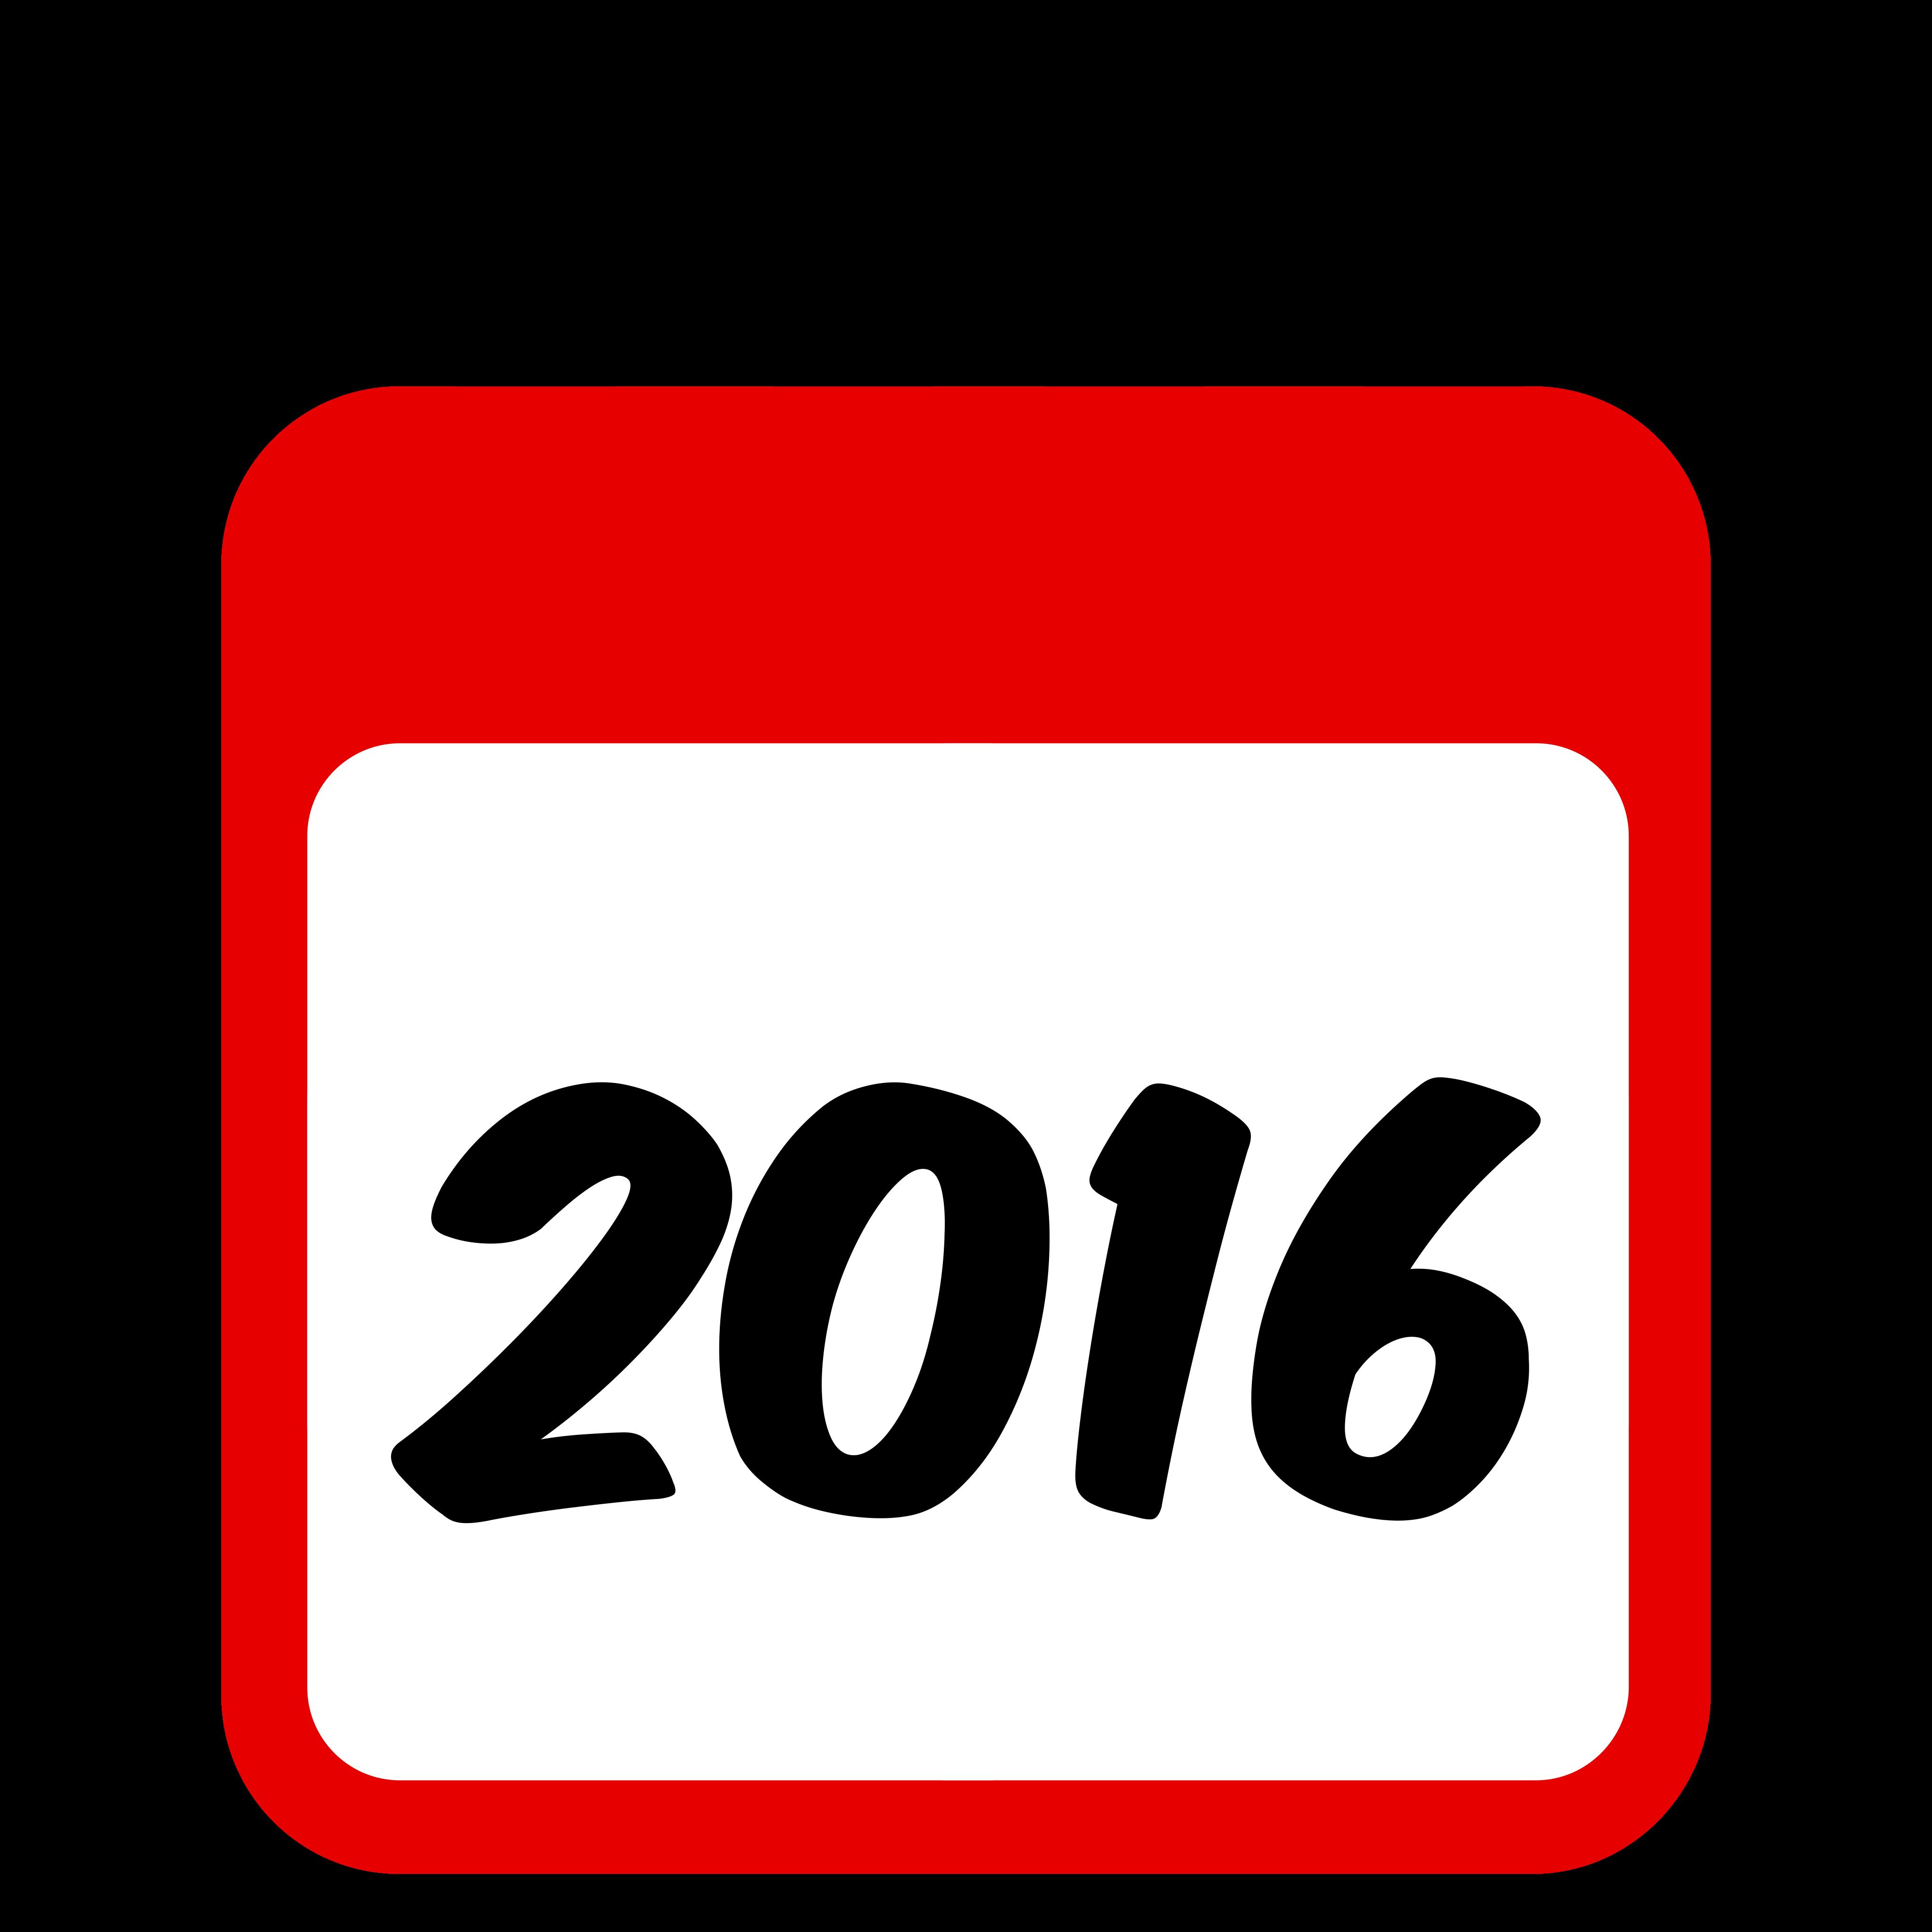 2016 Calendar Graphic